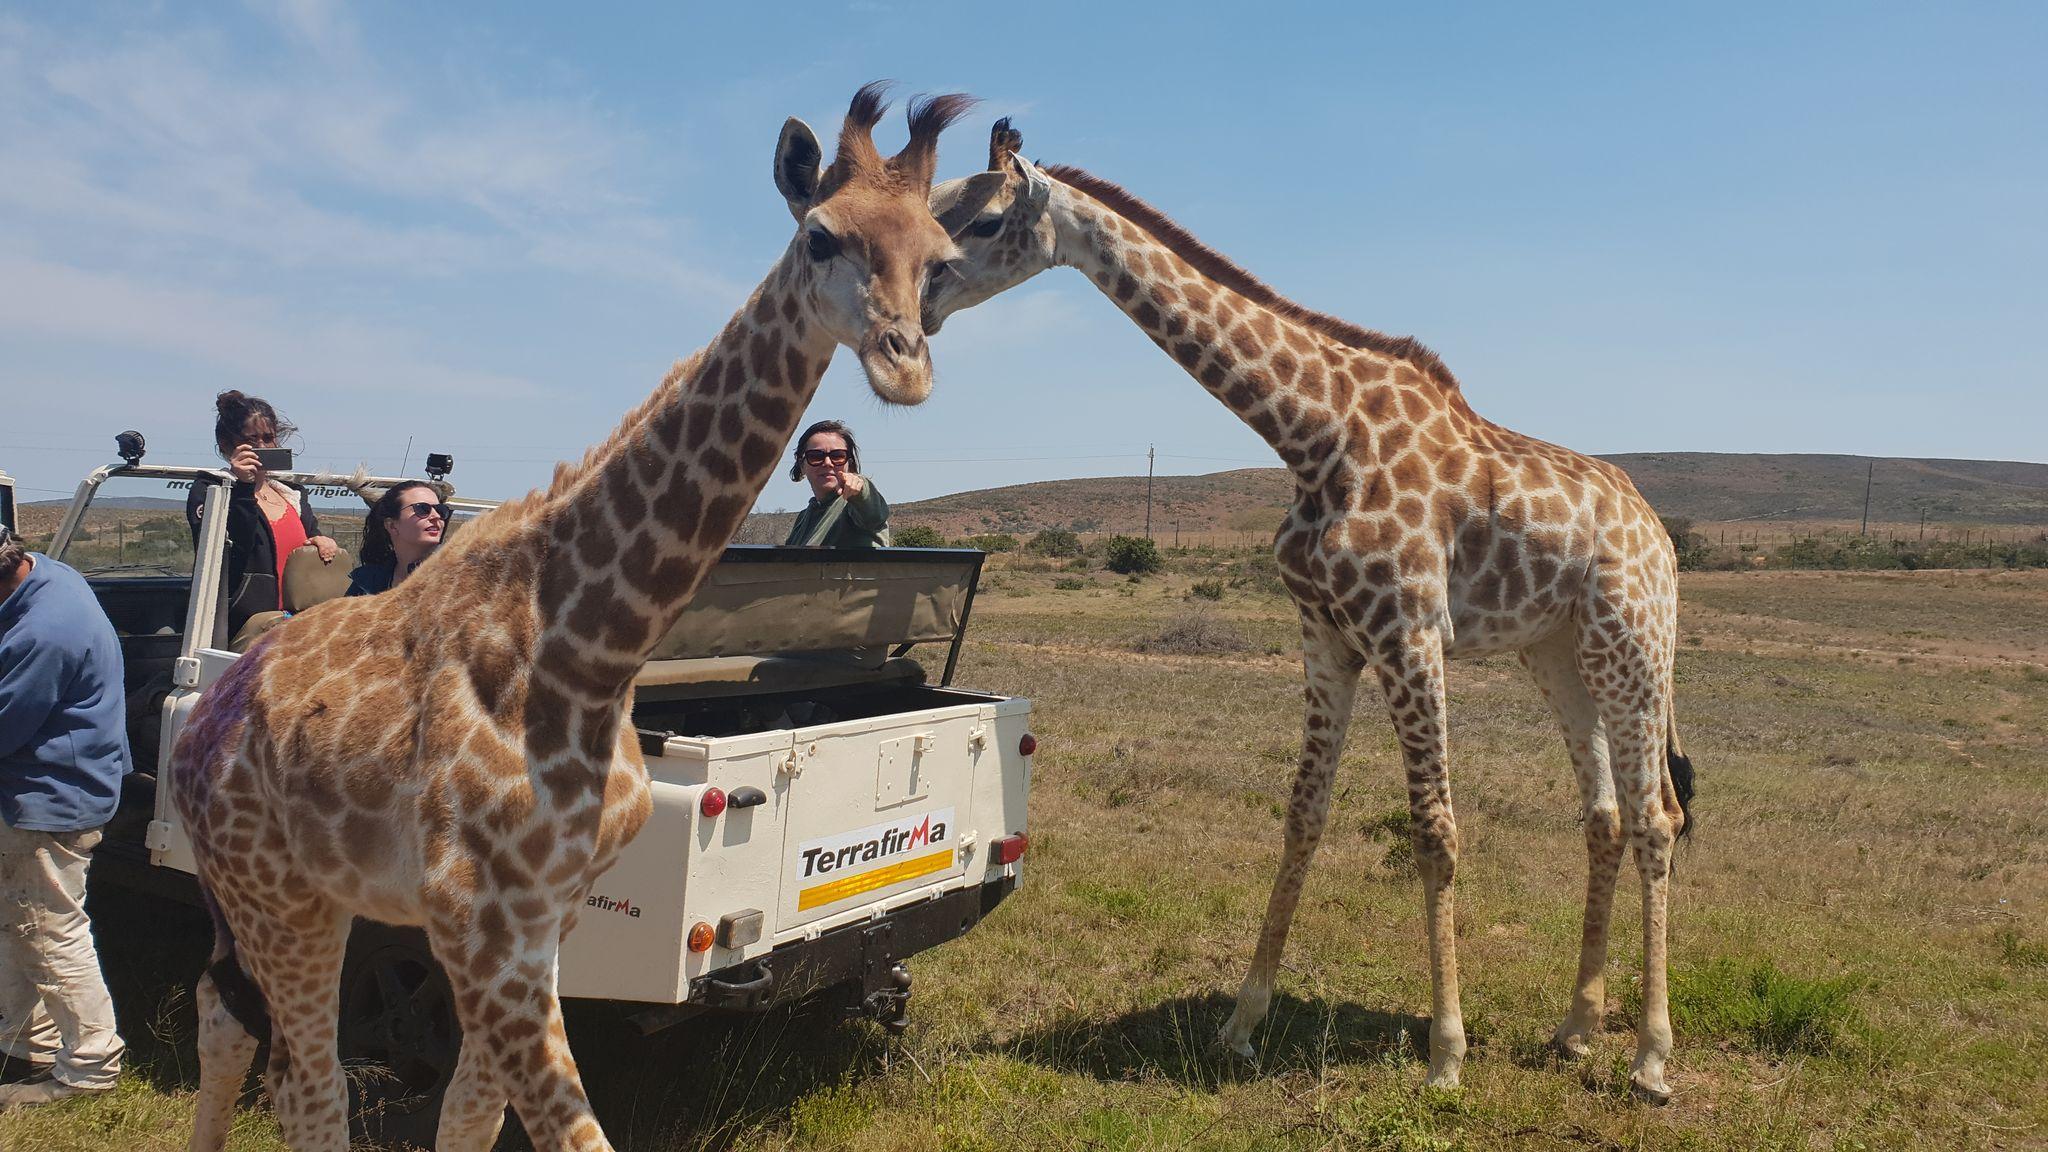 Giraffe and vols